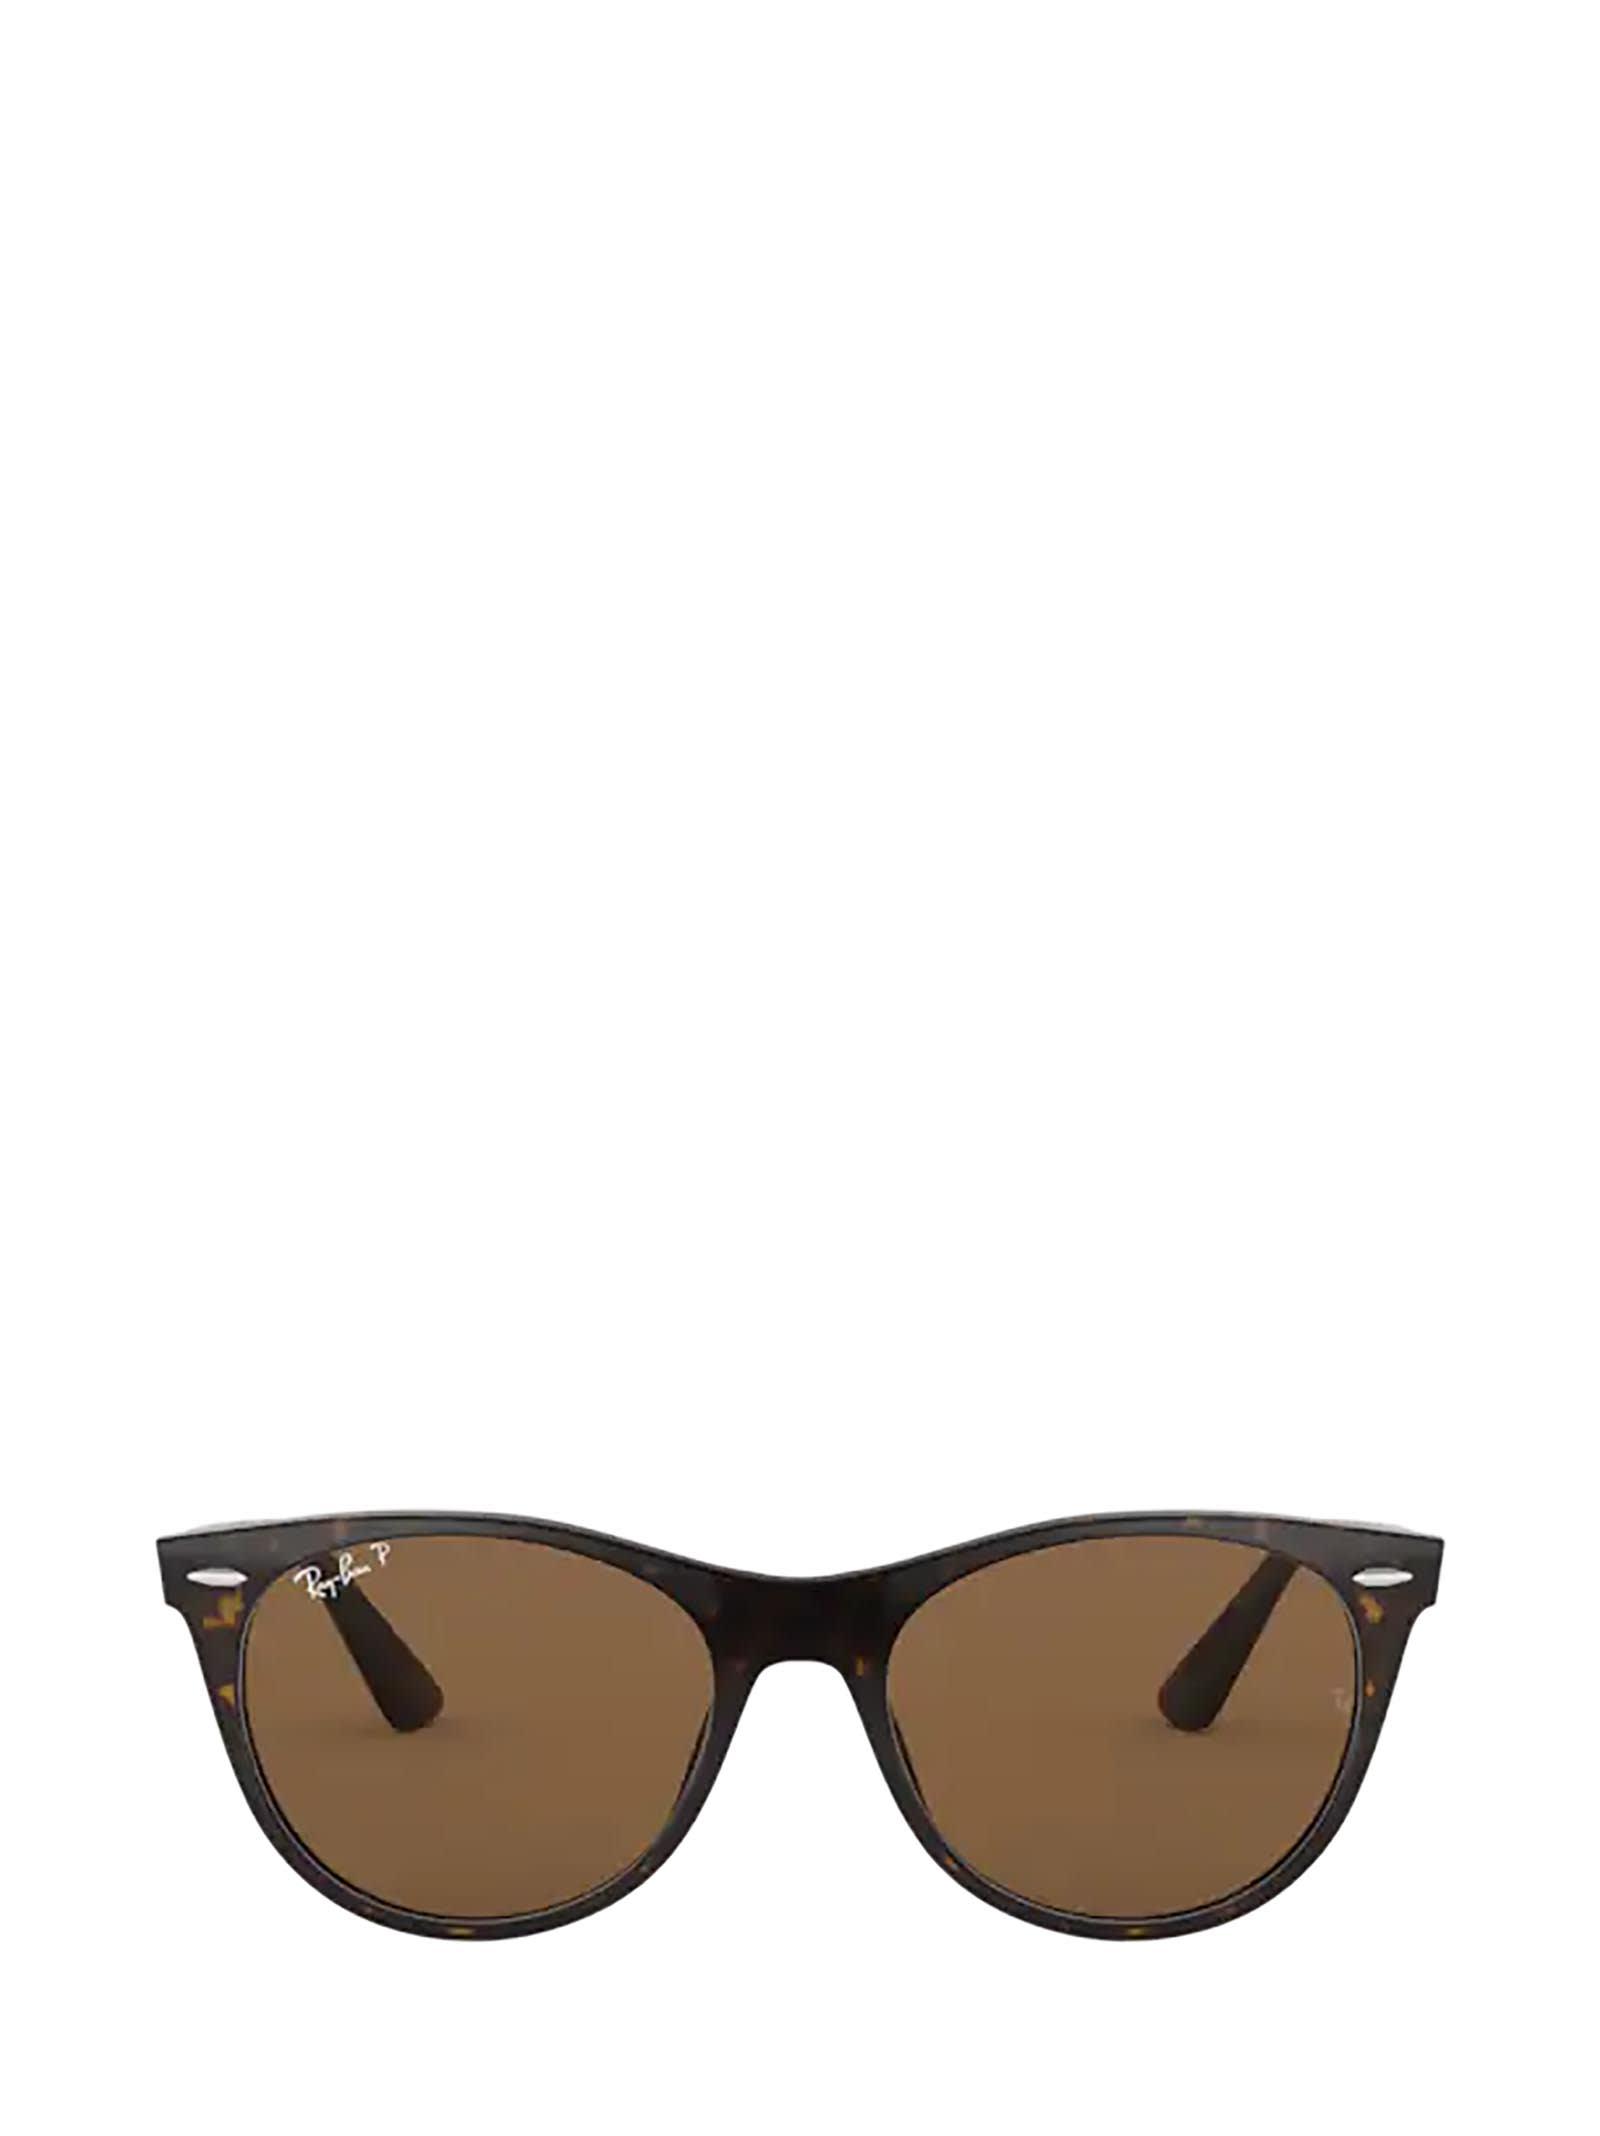 Ray-Ban Ray-ban Rb2185 Tortoise Sunglasses